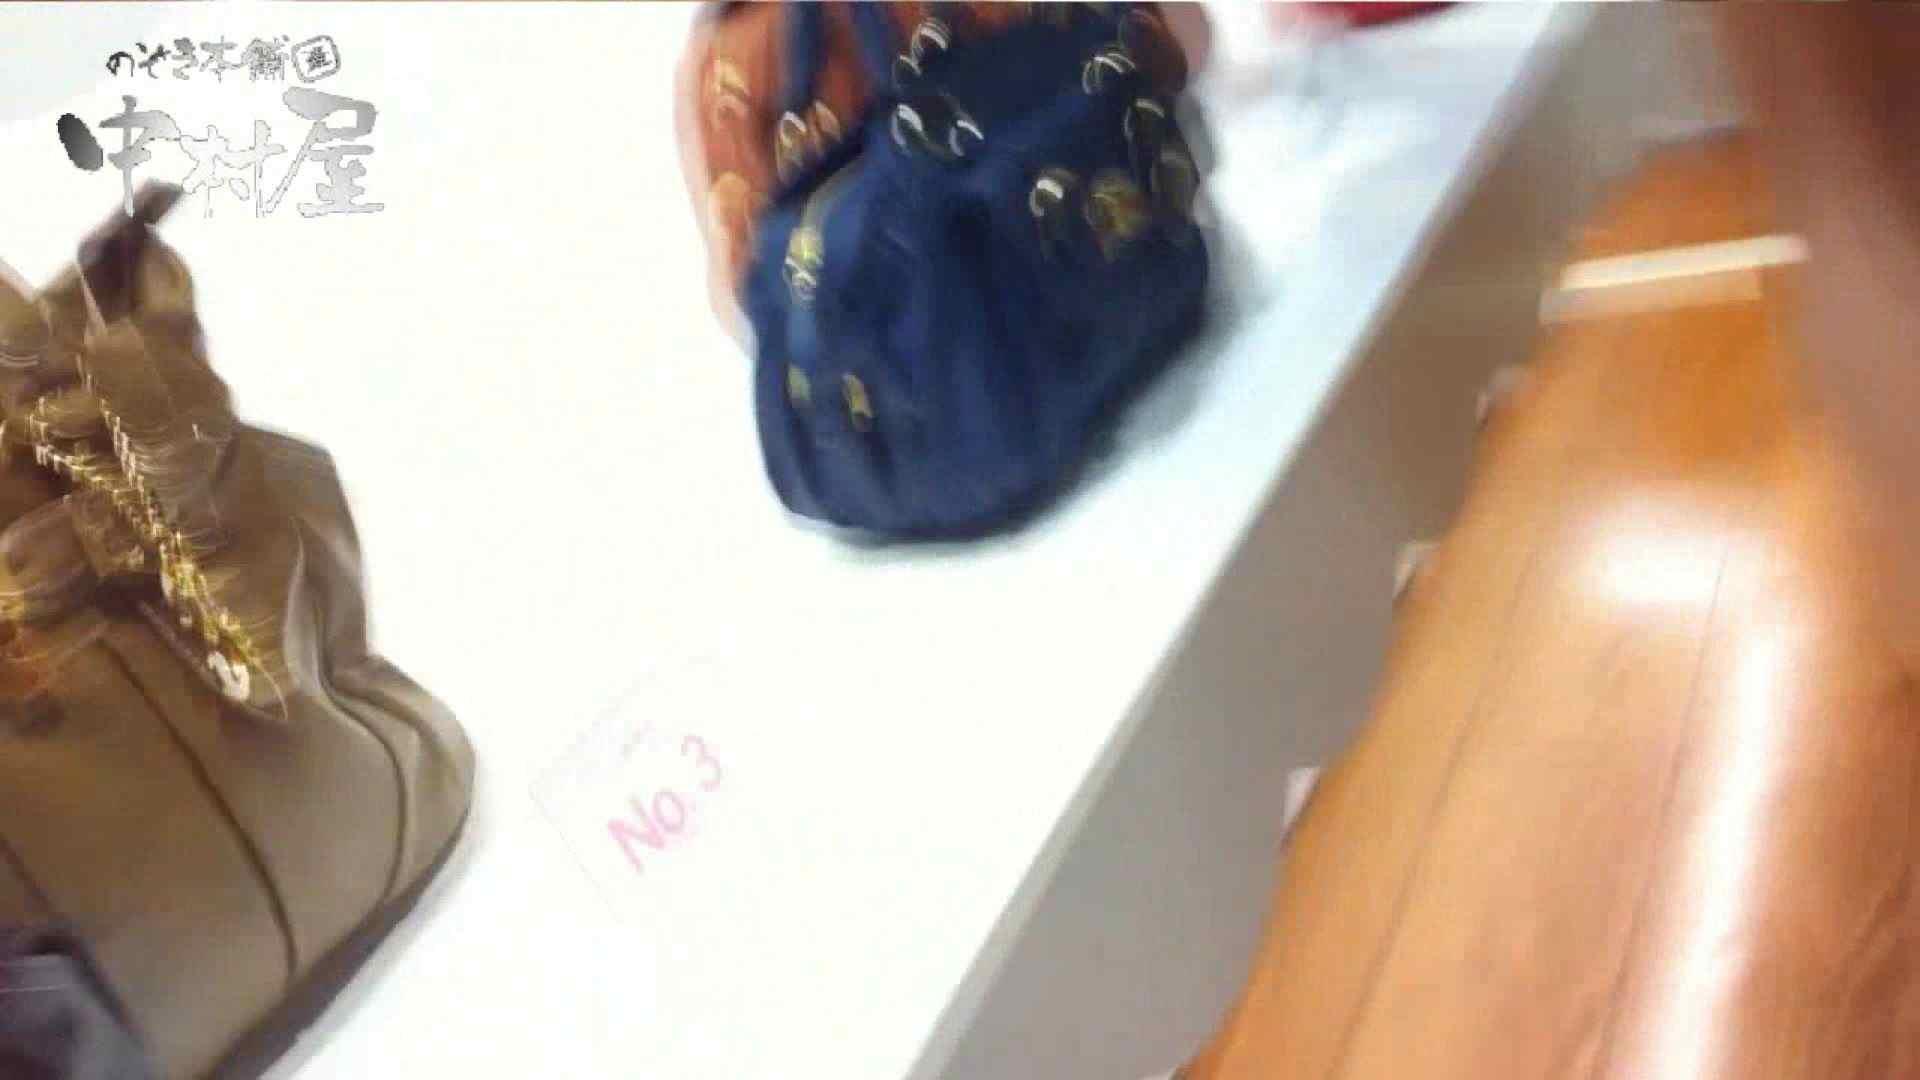 vol.48可愛いカリスマ店員胸チラ&パンチラ アニメ声の店員さん 胸チラ  96Pix 68